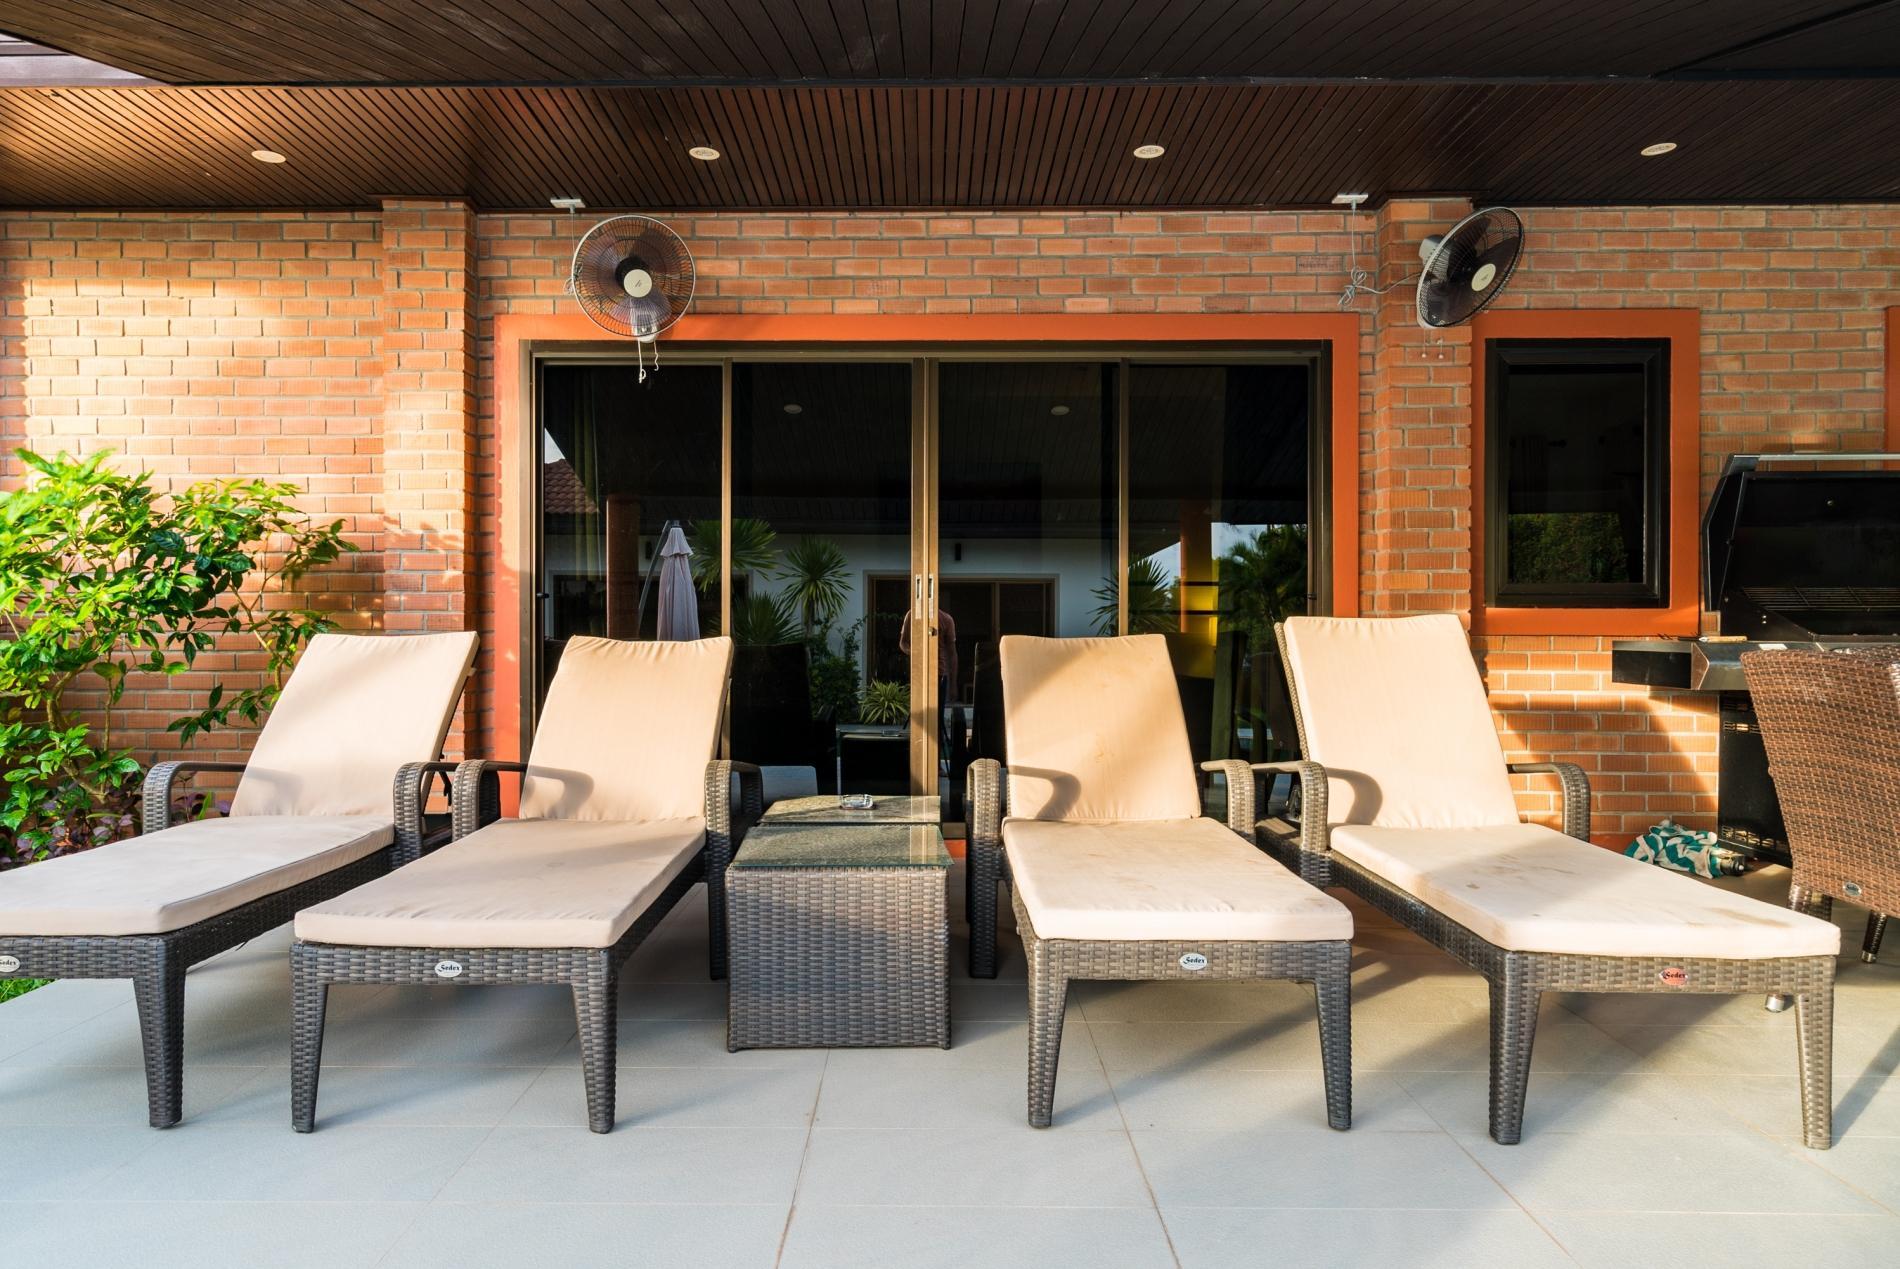 Pasak soi 3 - Convenient pool villa in quiet location, near Laguna, Boat avenue photo 8292541